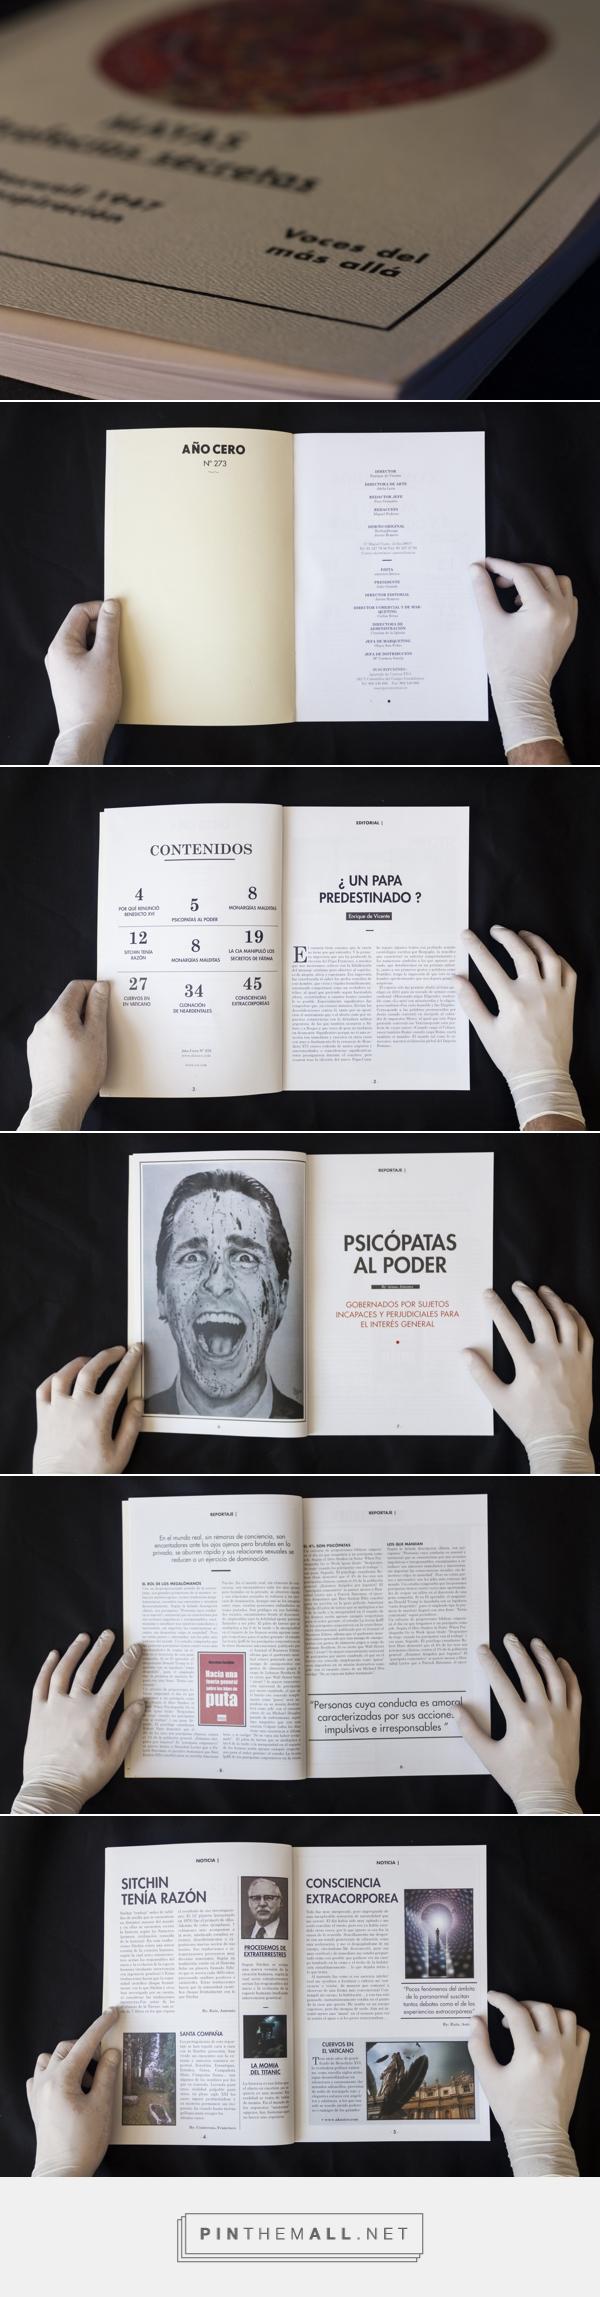 Rediseño Año Cero (Parte I: Revista)   Domestika - created via http://pinthemall.net